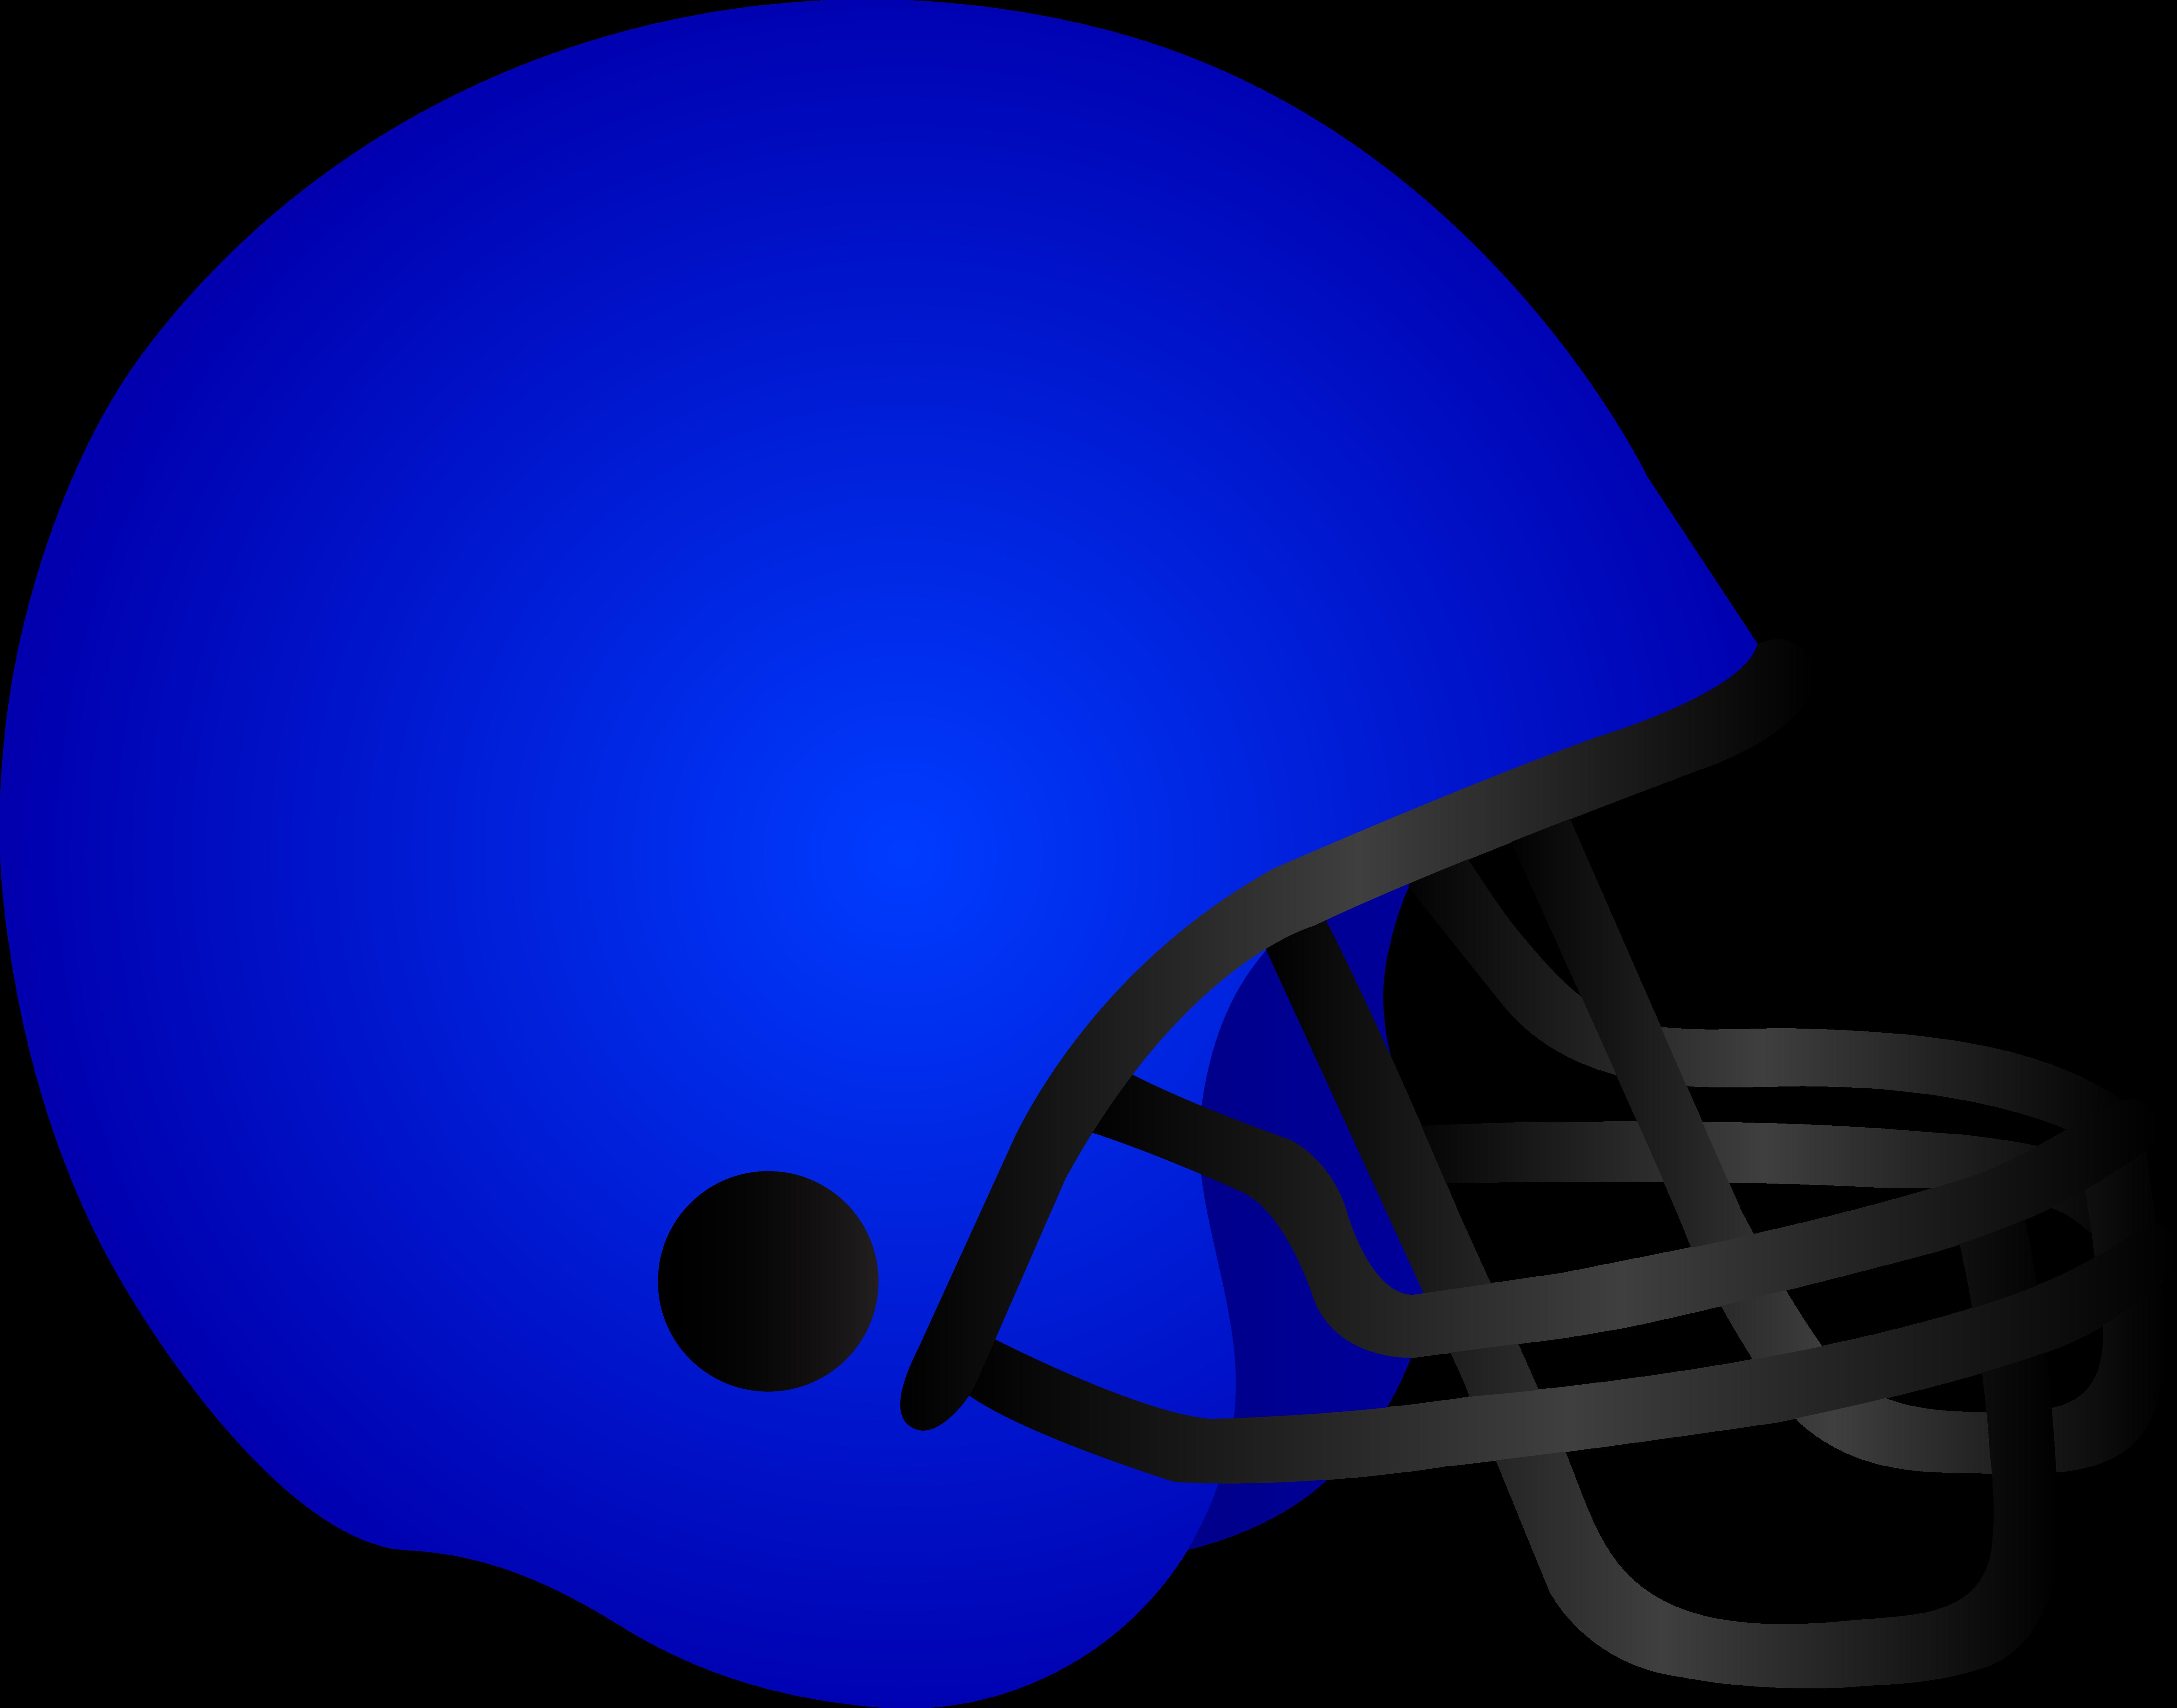 6994x5488 Football Helmet Clipart Transparent